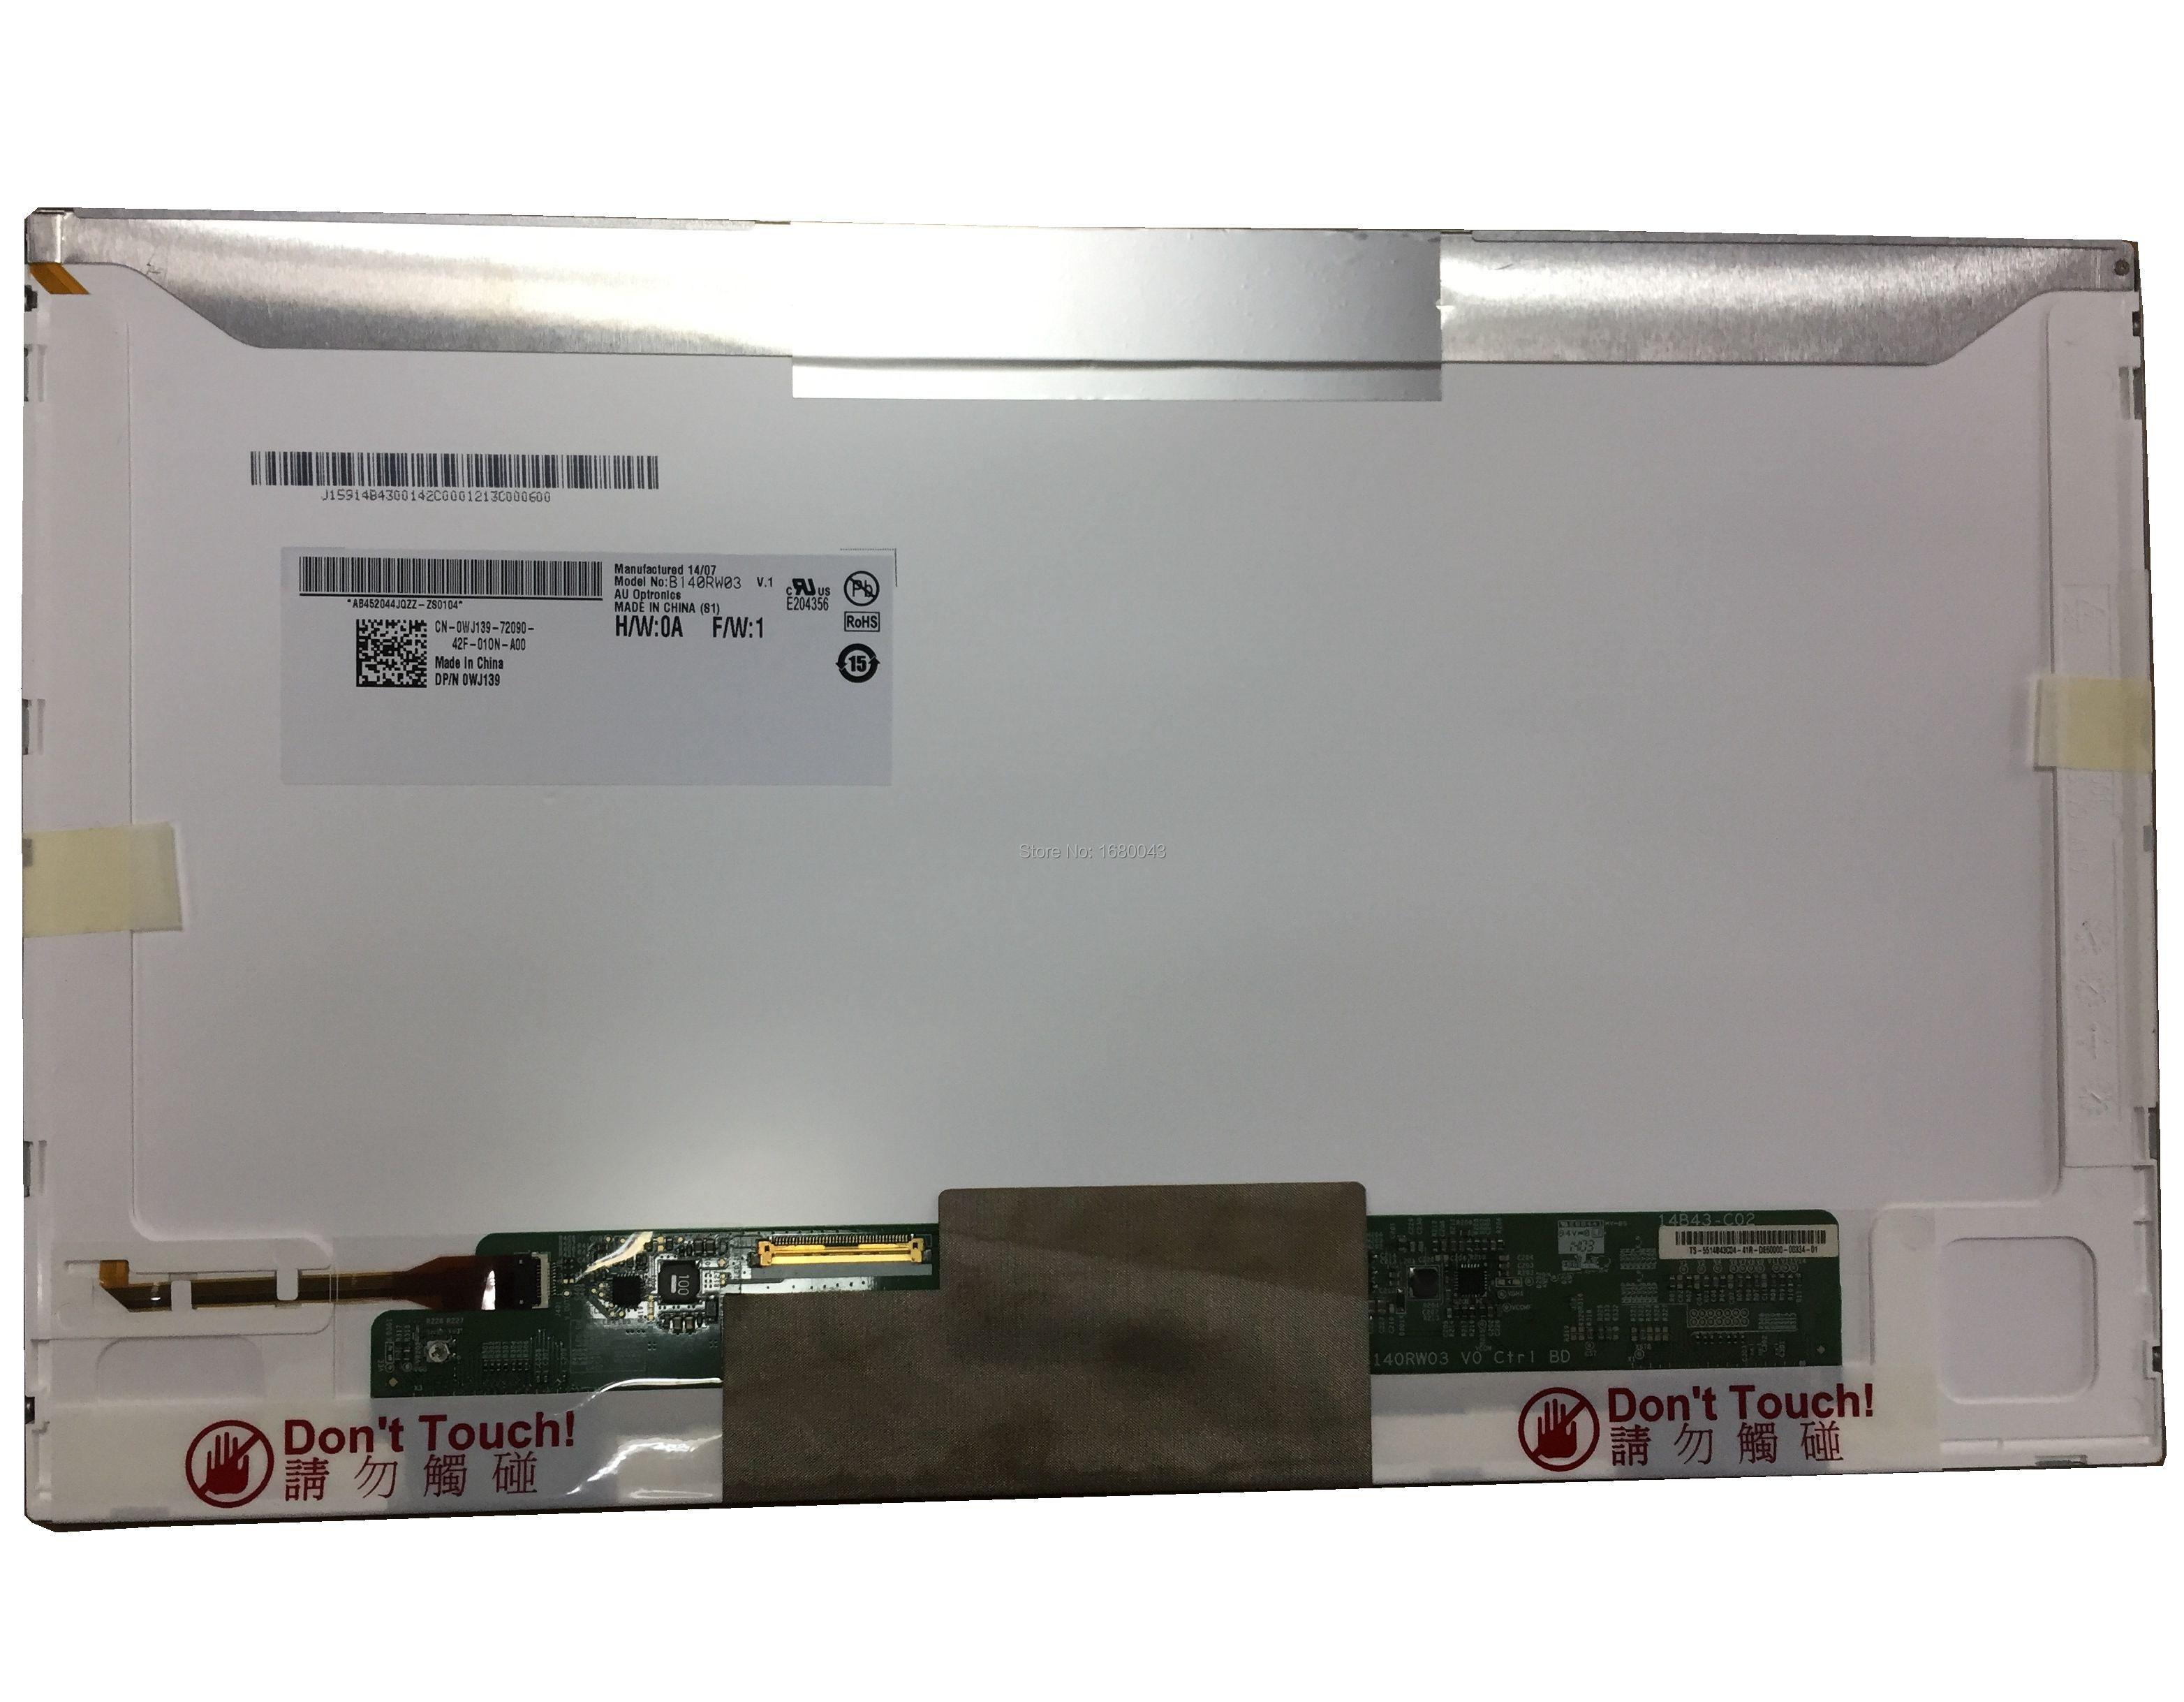 B140RW03 V.1 V.0 صالح LTN140KT04 N140O6-L02 LTN140KT01 LTN140KT07 LP140WD1 TLM1 40PIN 1600*900 جديد LED عرض شاشة الكمبيوتر المحمول